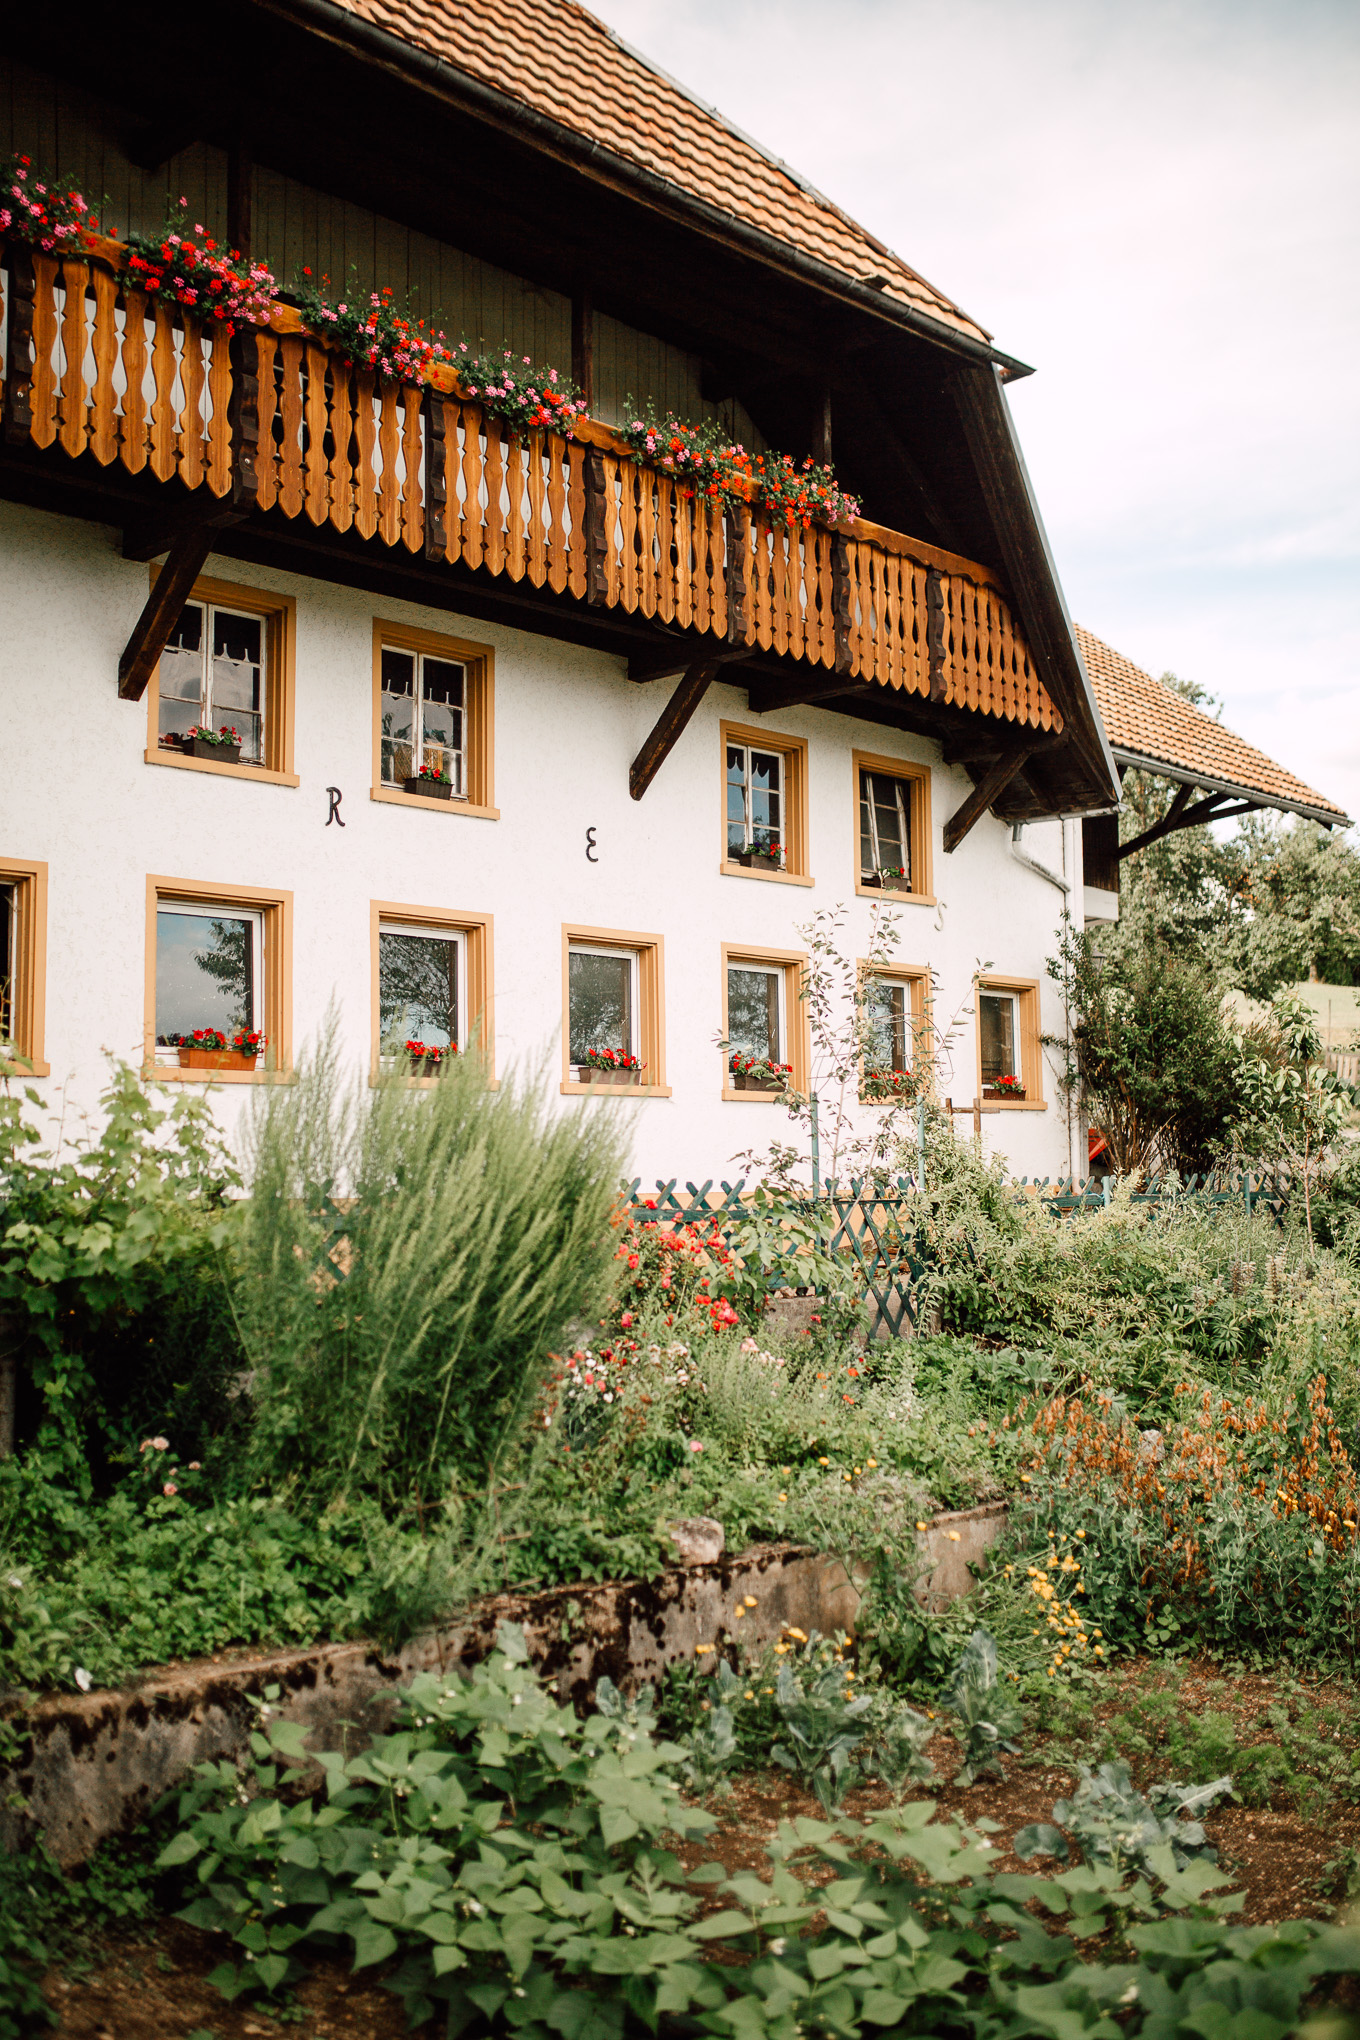 Boho-Scheune-Bauern-Hochzeit-Lörrach-Rheinfelden-Pia-Anna-Christian-Photography-NC-62.jpg